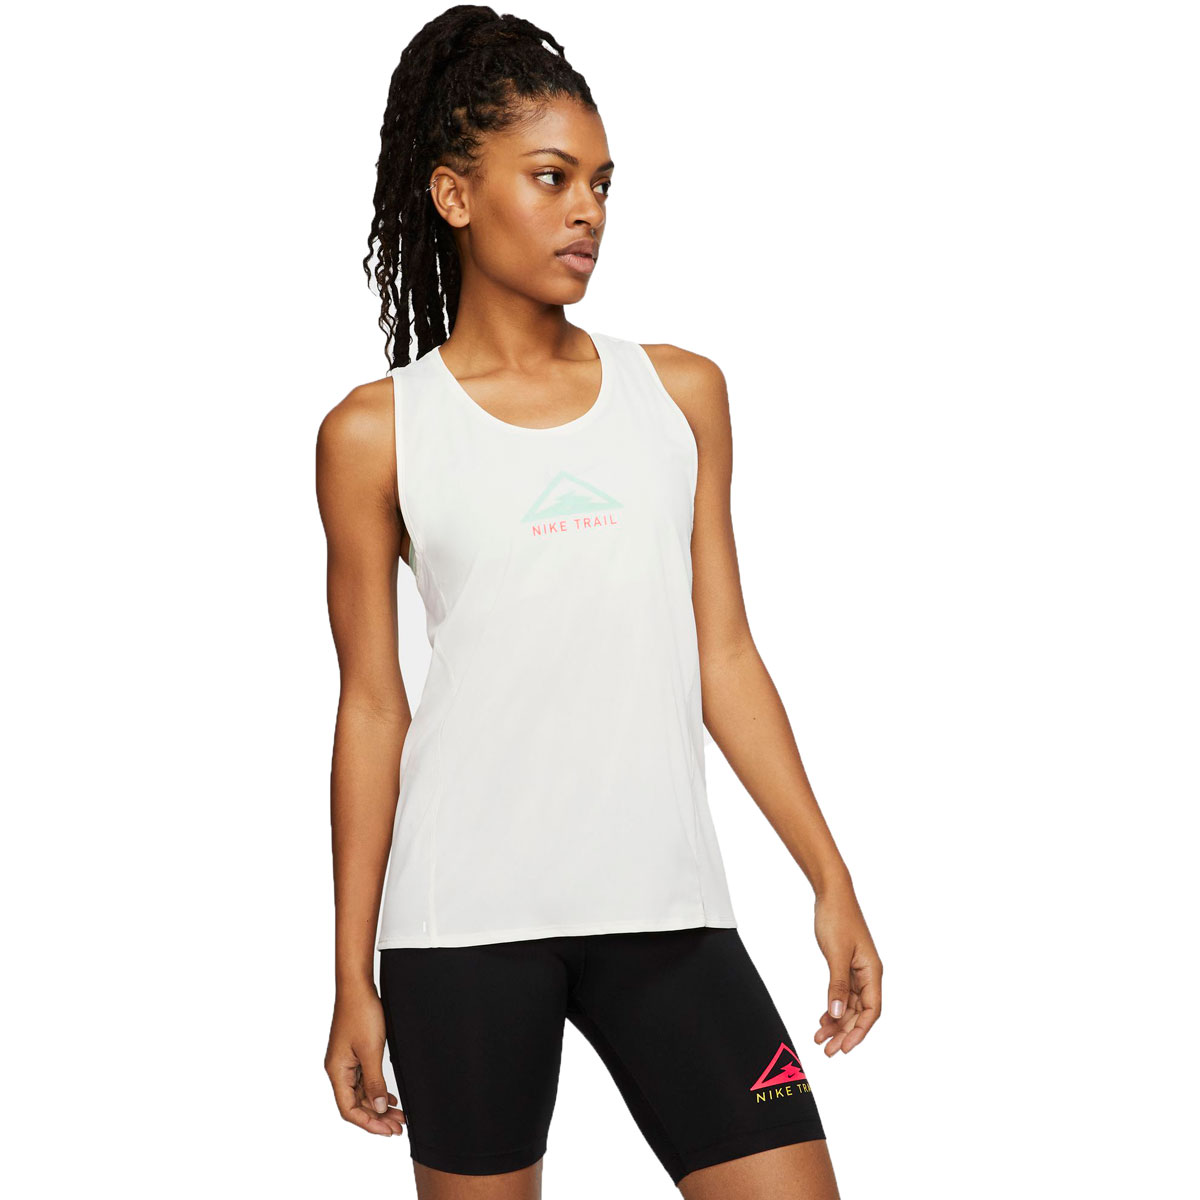 Women's Nike City Sleek Trail Running Tank - Color: Sail/Mint Foam/Laser Crimson - Size: XS, Sail/Mint Foam/Laser Crimson, large, image 1